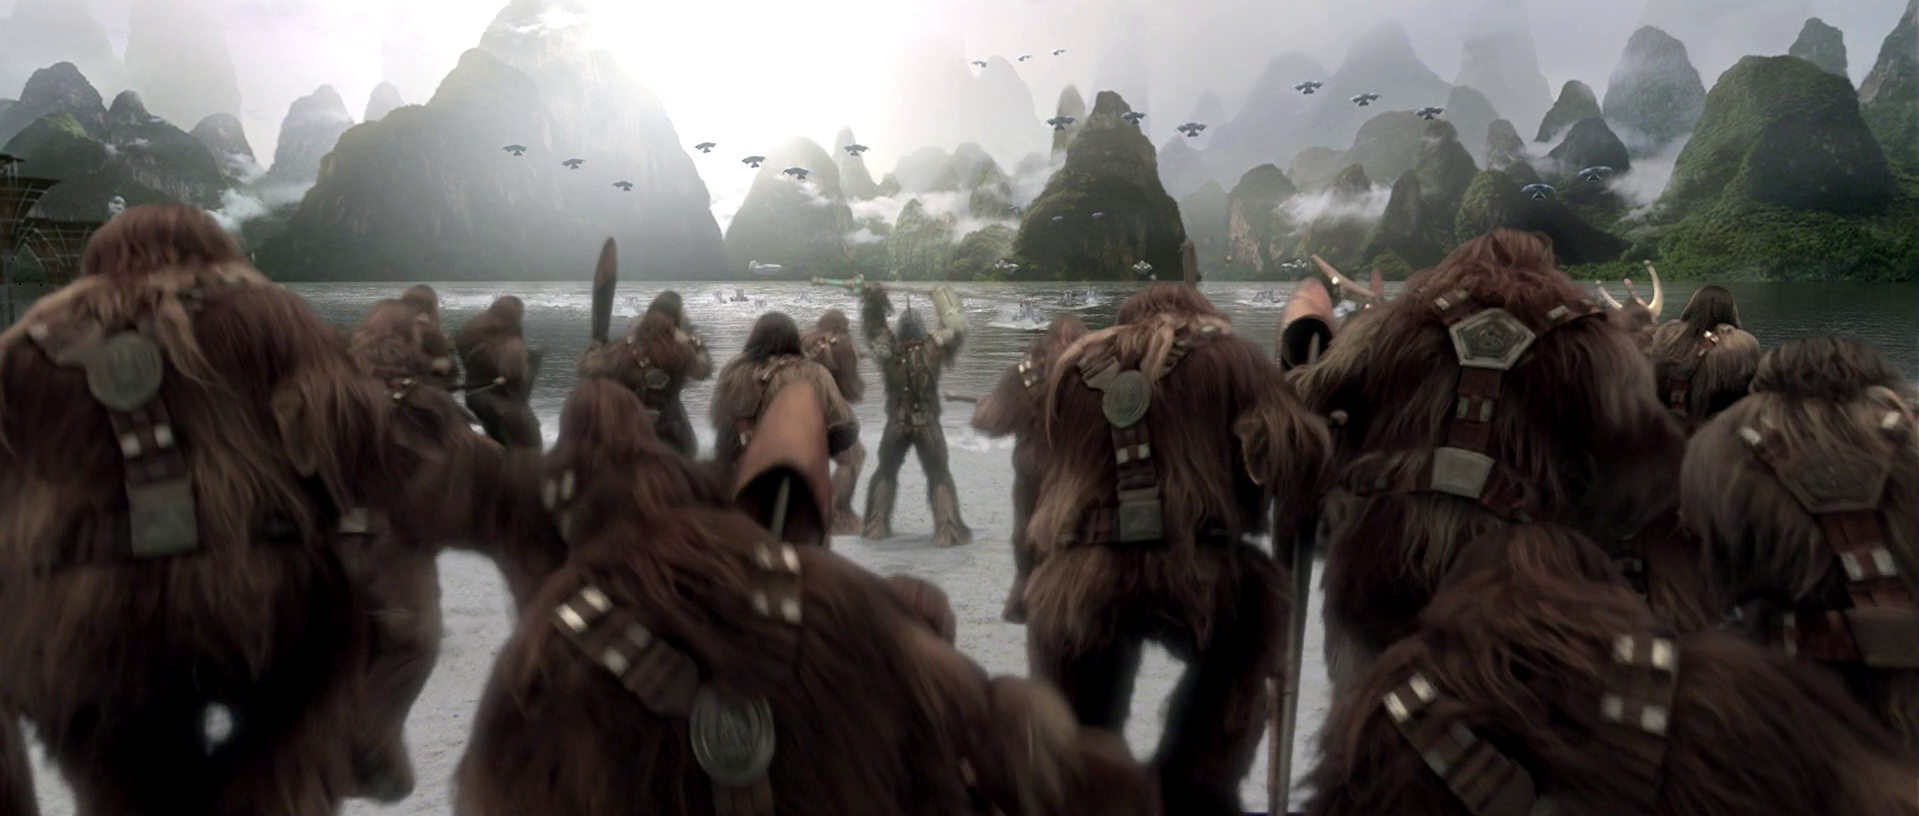 Kachirho Wookiee Militia